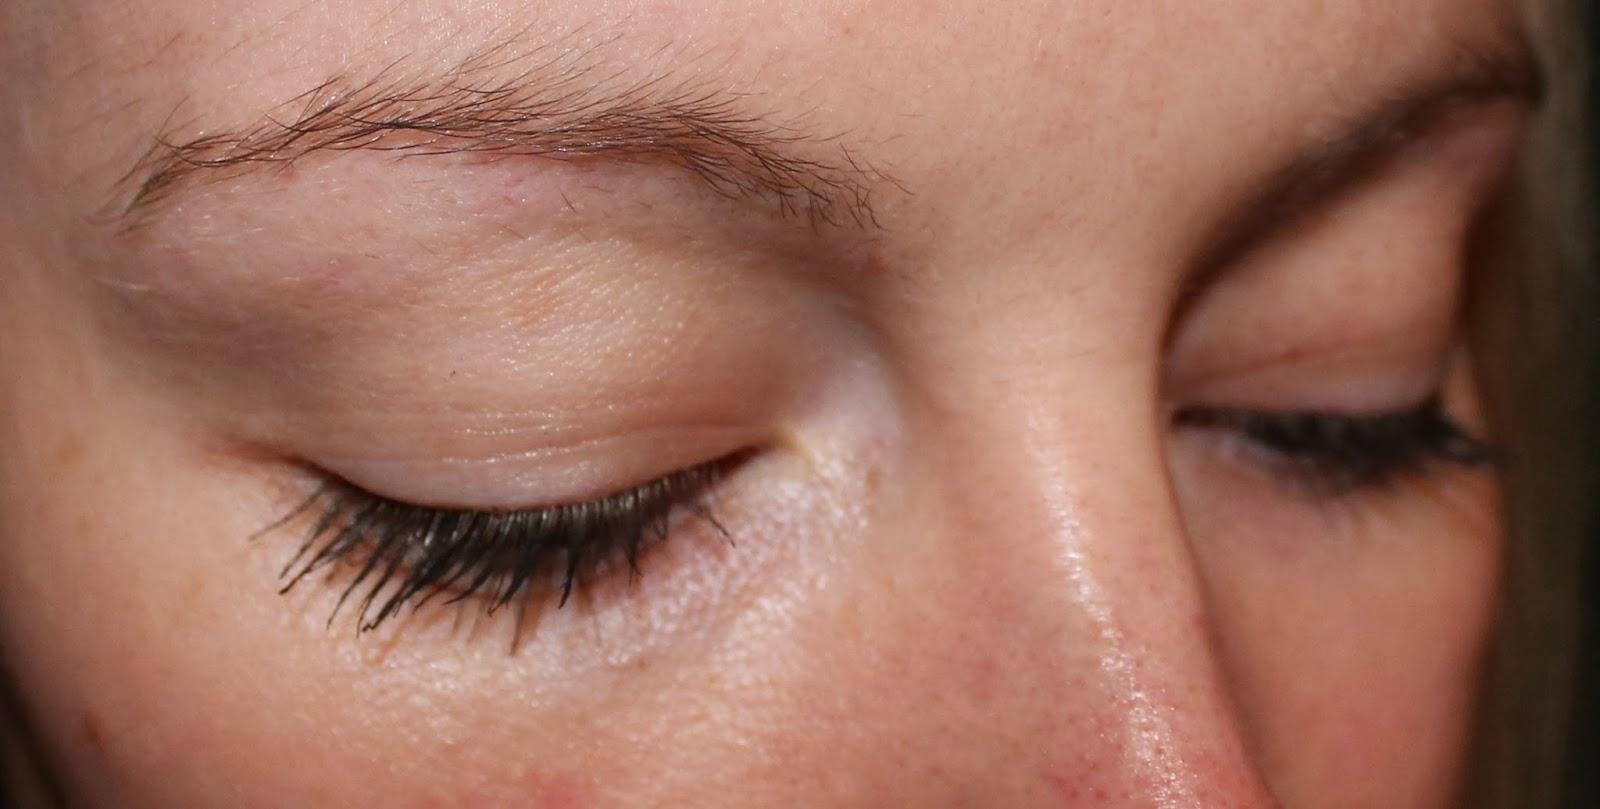 Rimmel-Scandaleyes-Retro-Glam-Mascara-eye-eyelashes